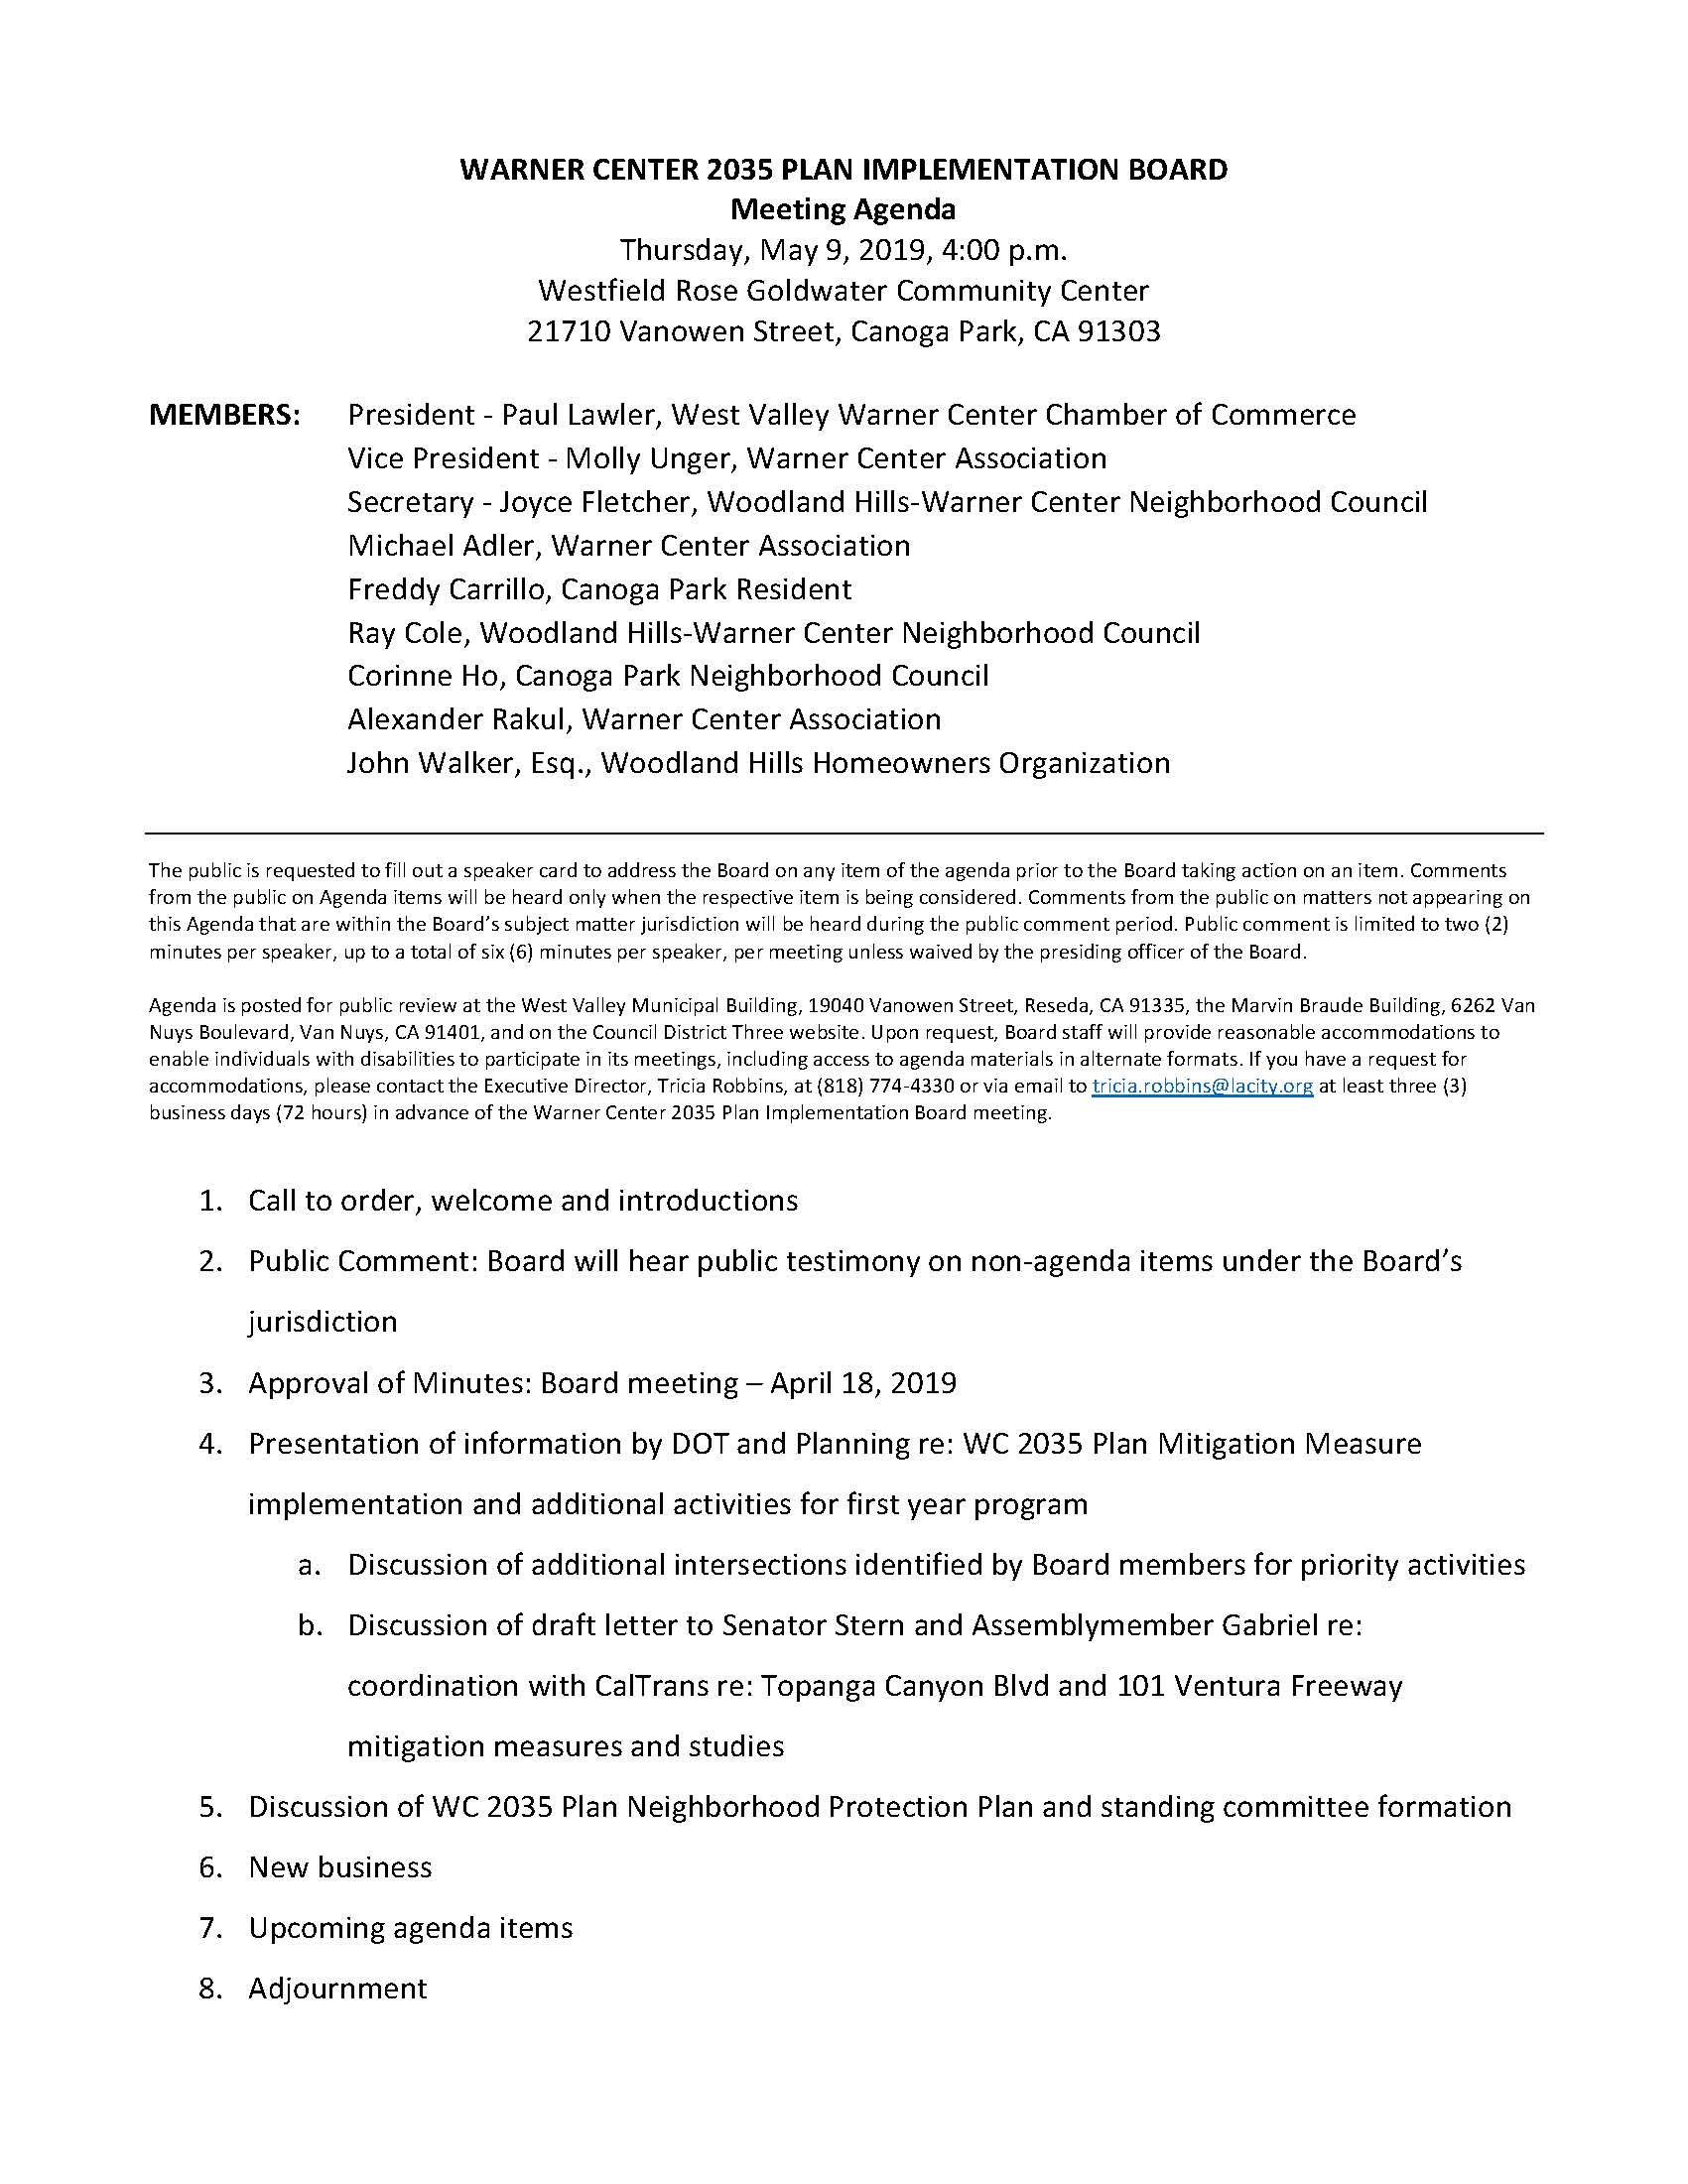 5.9.19_Mtg_Agenda_WC_2035_PLAN_IMPLEMENTATION_BOARD.jpg